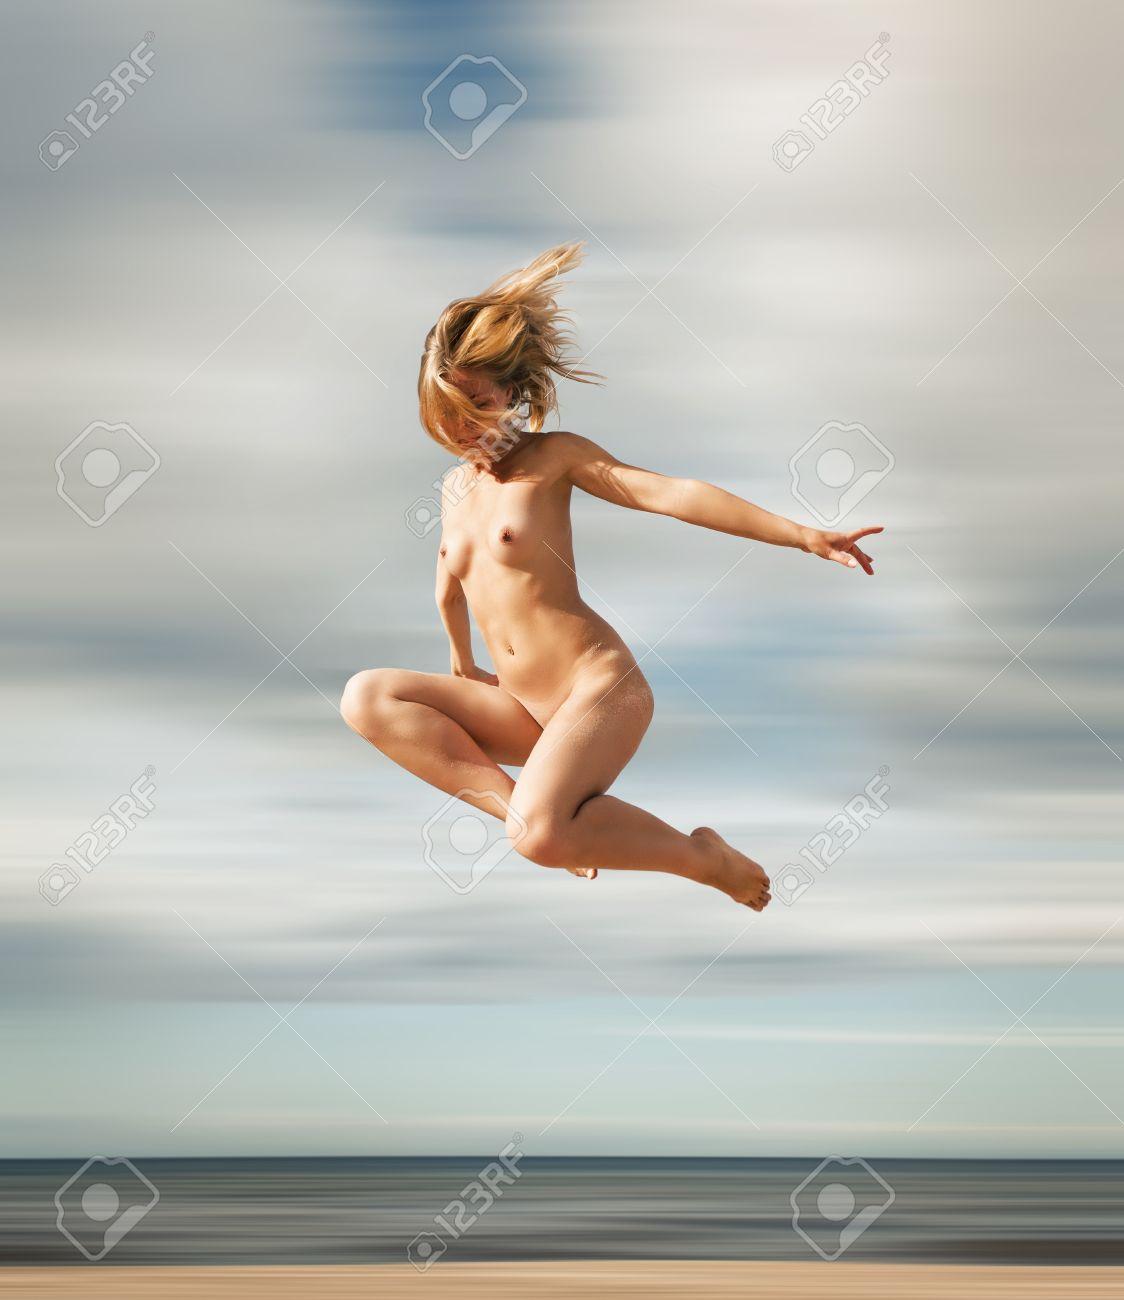 Wife nude jumping